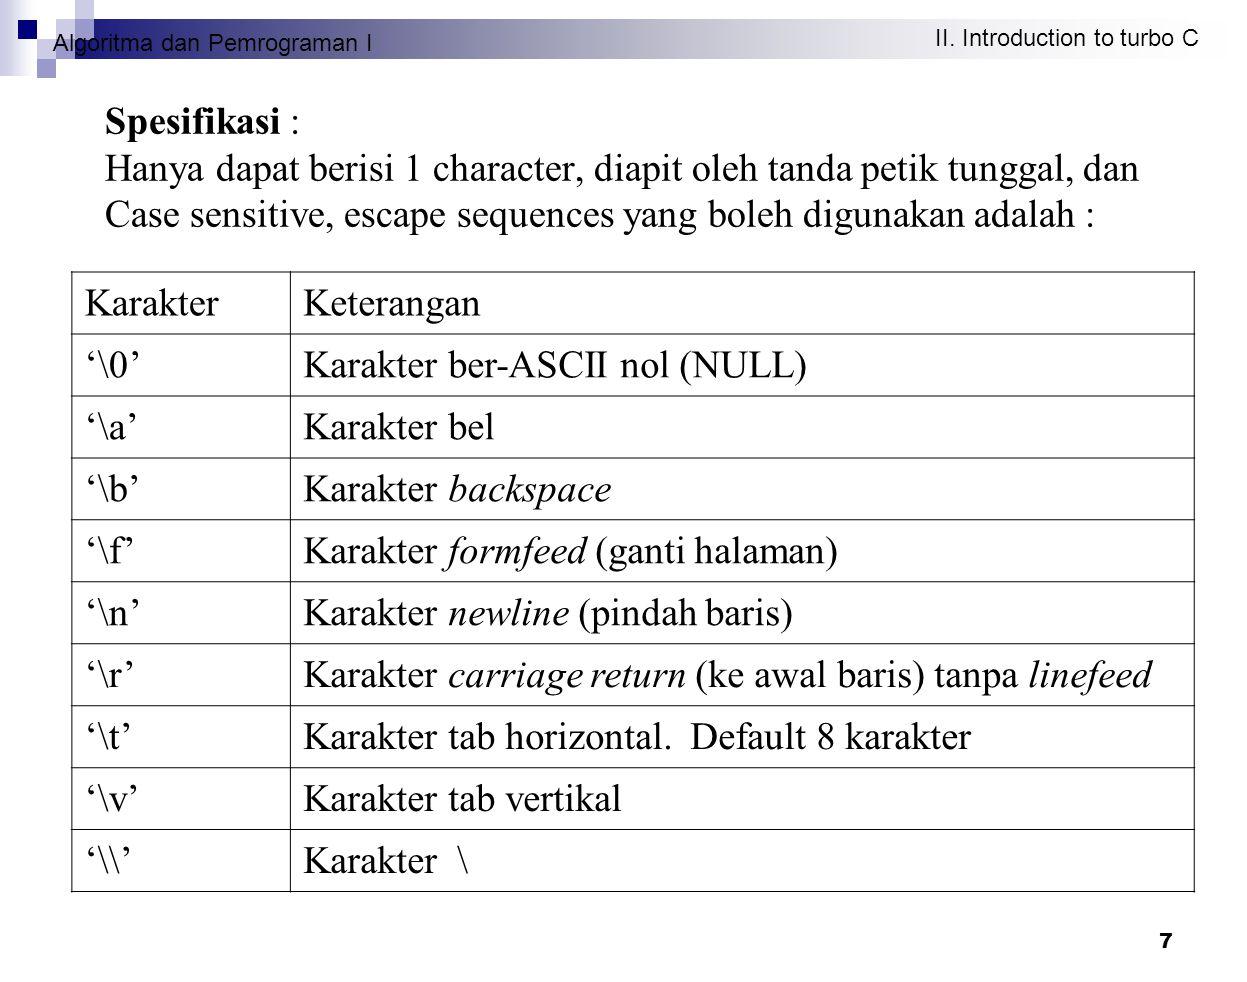 Algoritma dan Pemrograman I II. Introduction to turbo C 7 Spesifikasi : Hanya dapat berisi 1 character, diapit oleh tanda petik tunggal, dan Case sens